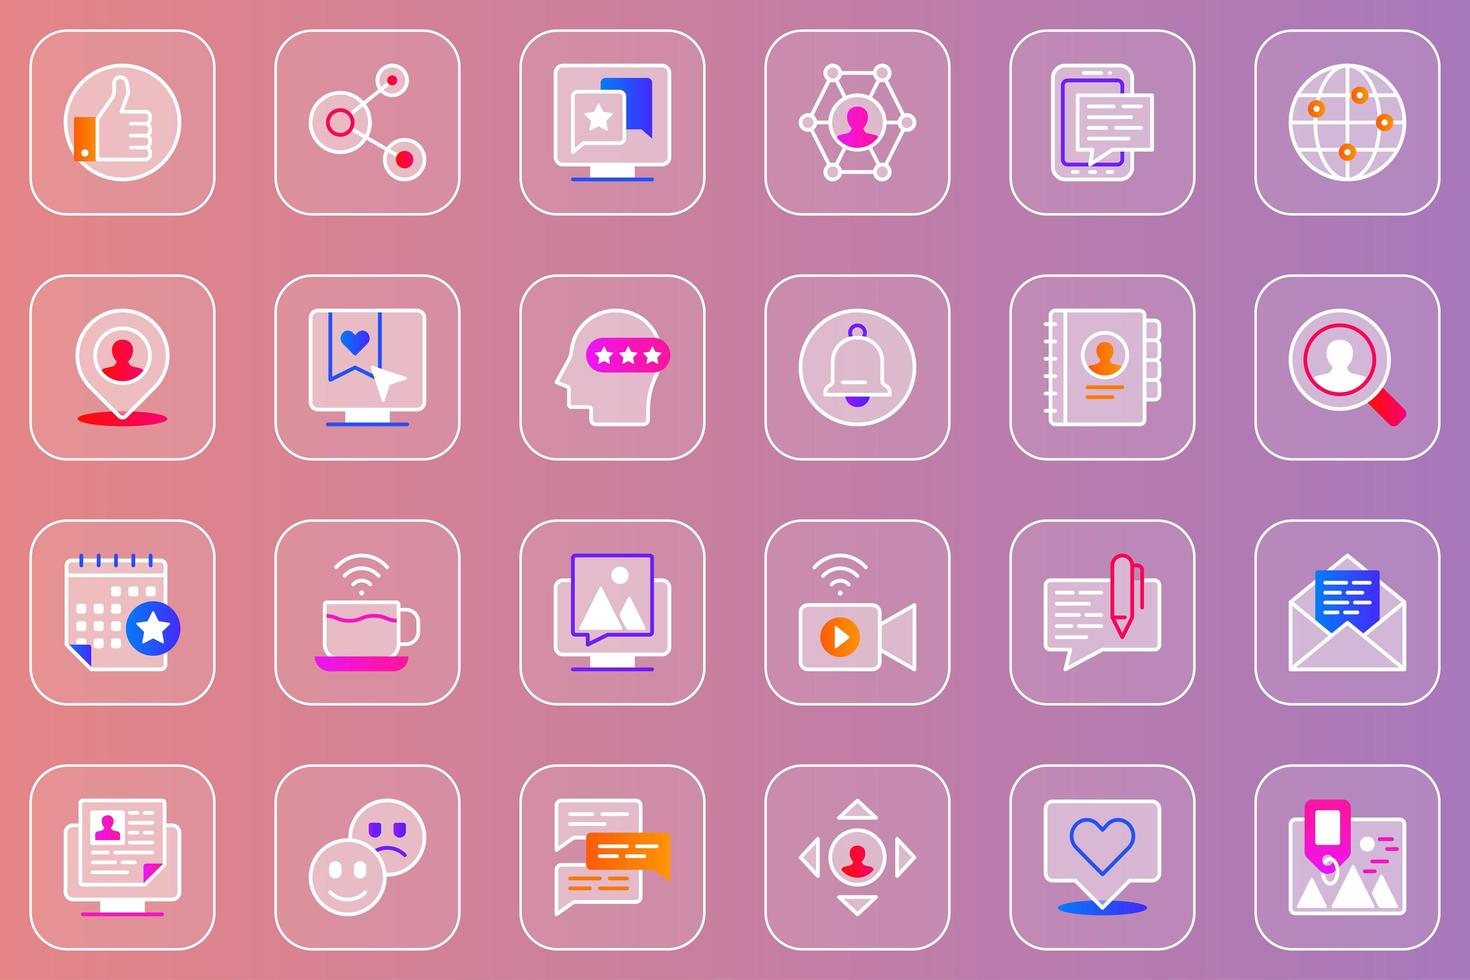 conjunto de ícones de glassmorphic da web de rede social vetor